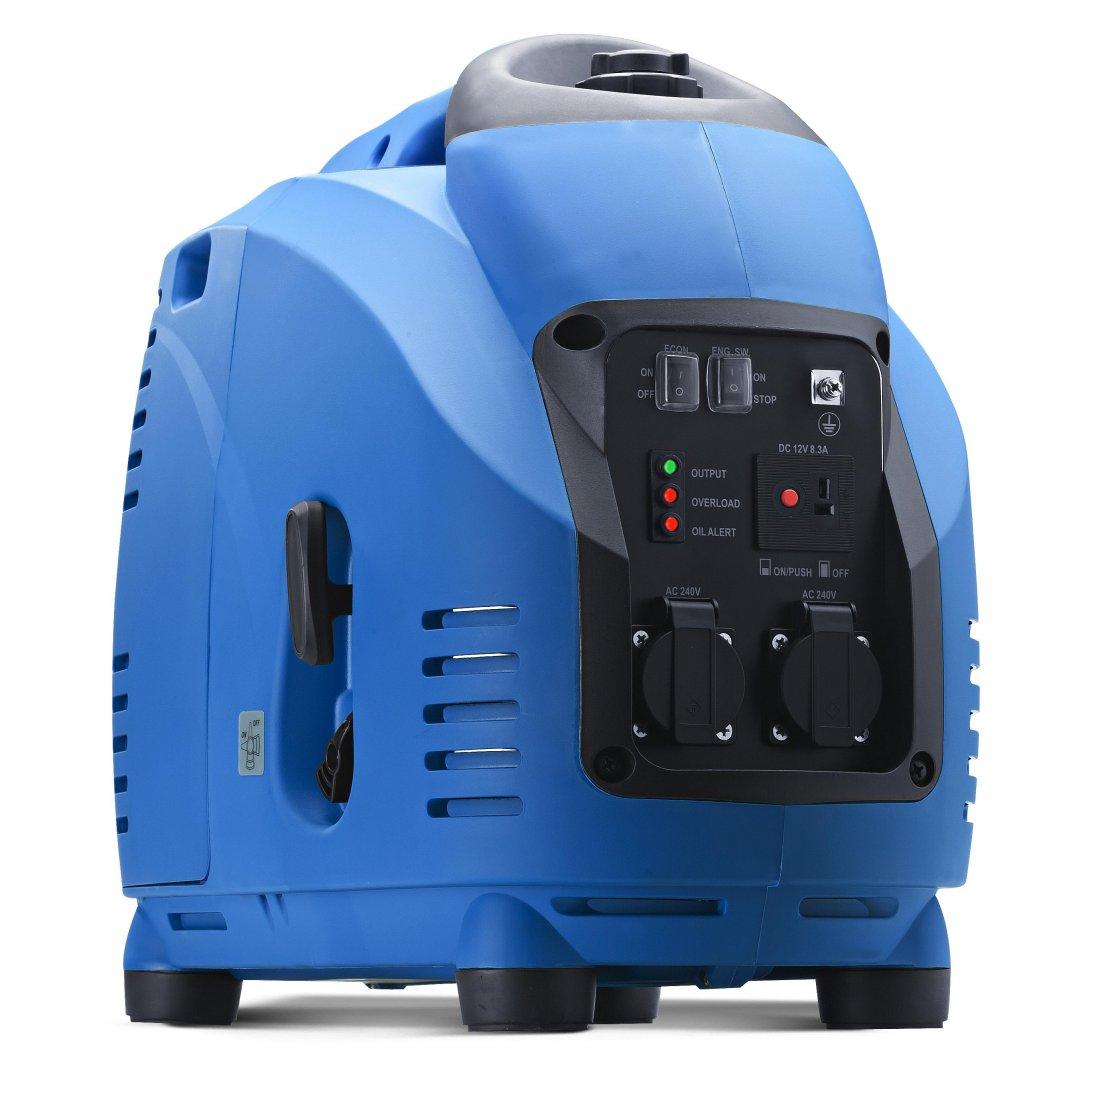 BEST SELLER - GenTrax 3.5kW Pure Sine Wave Petrol Inverter Camping Generator